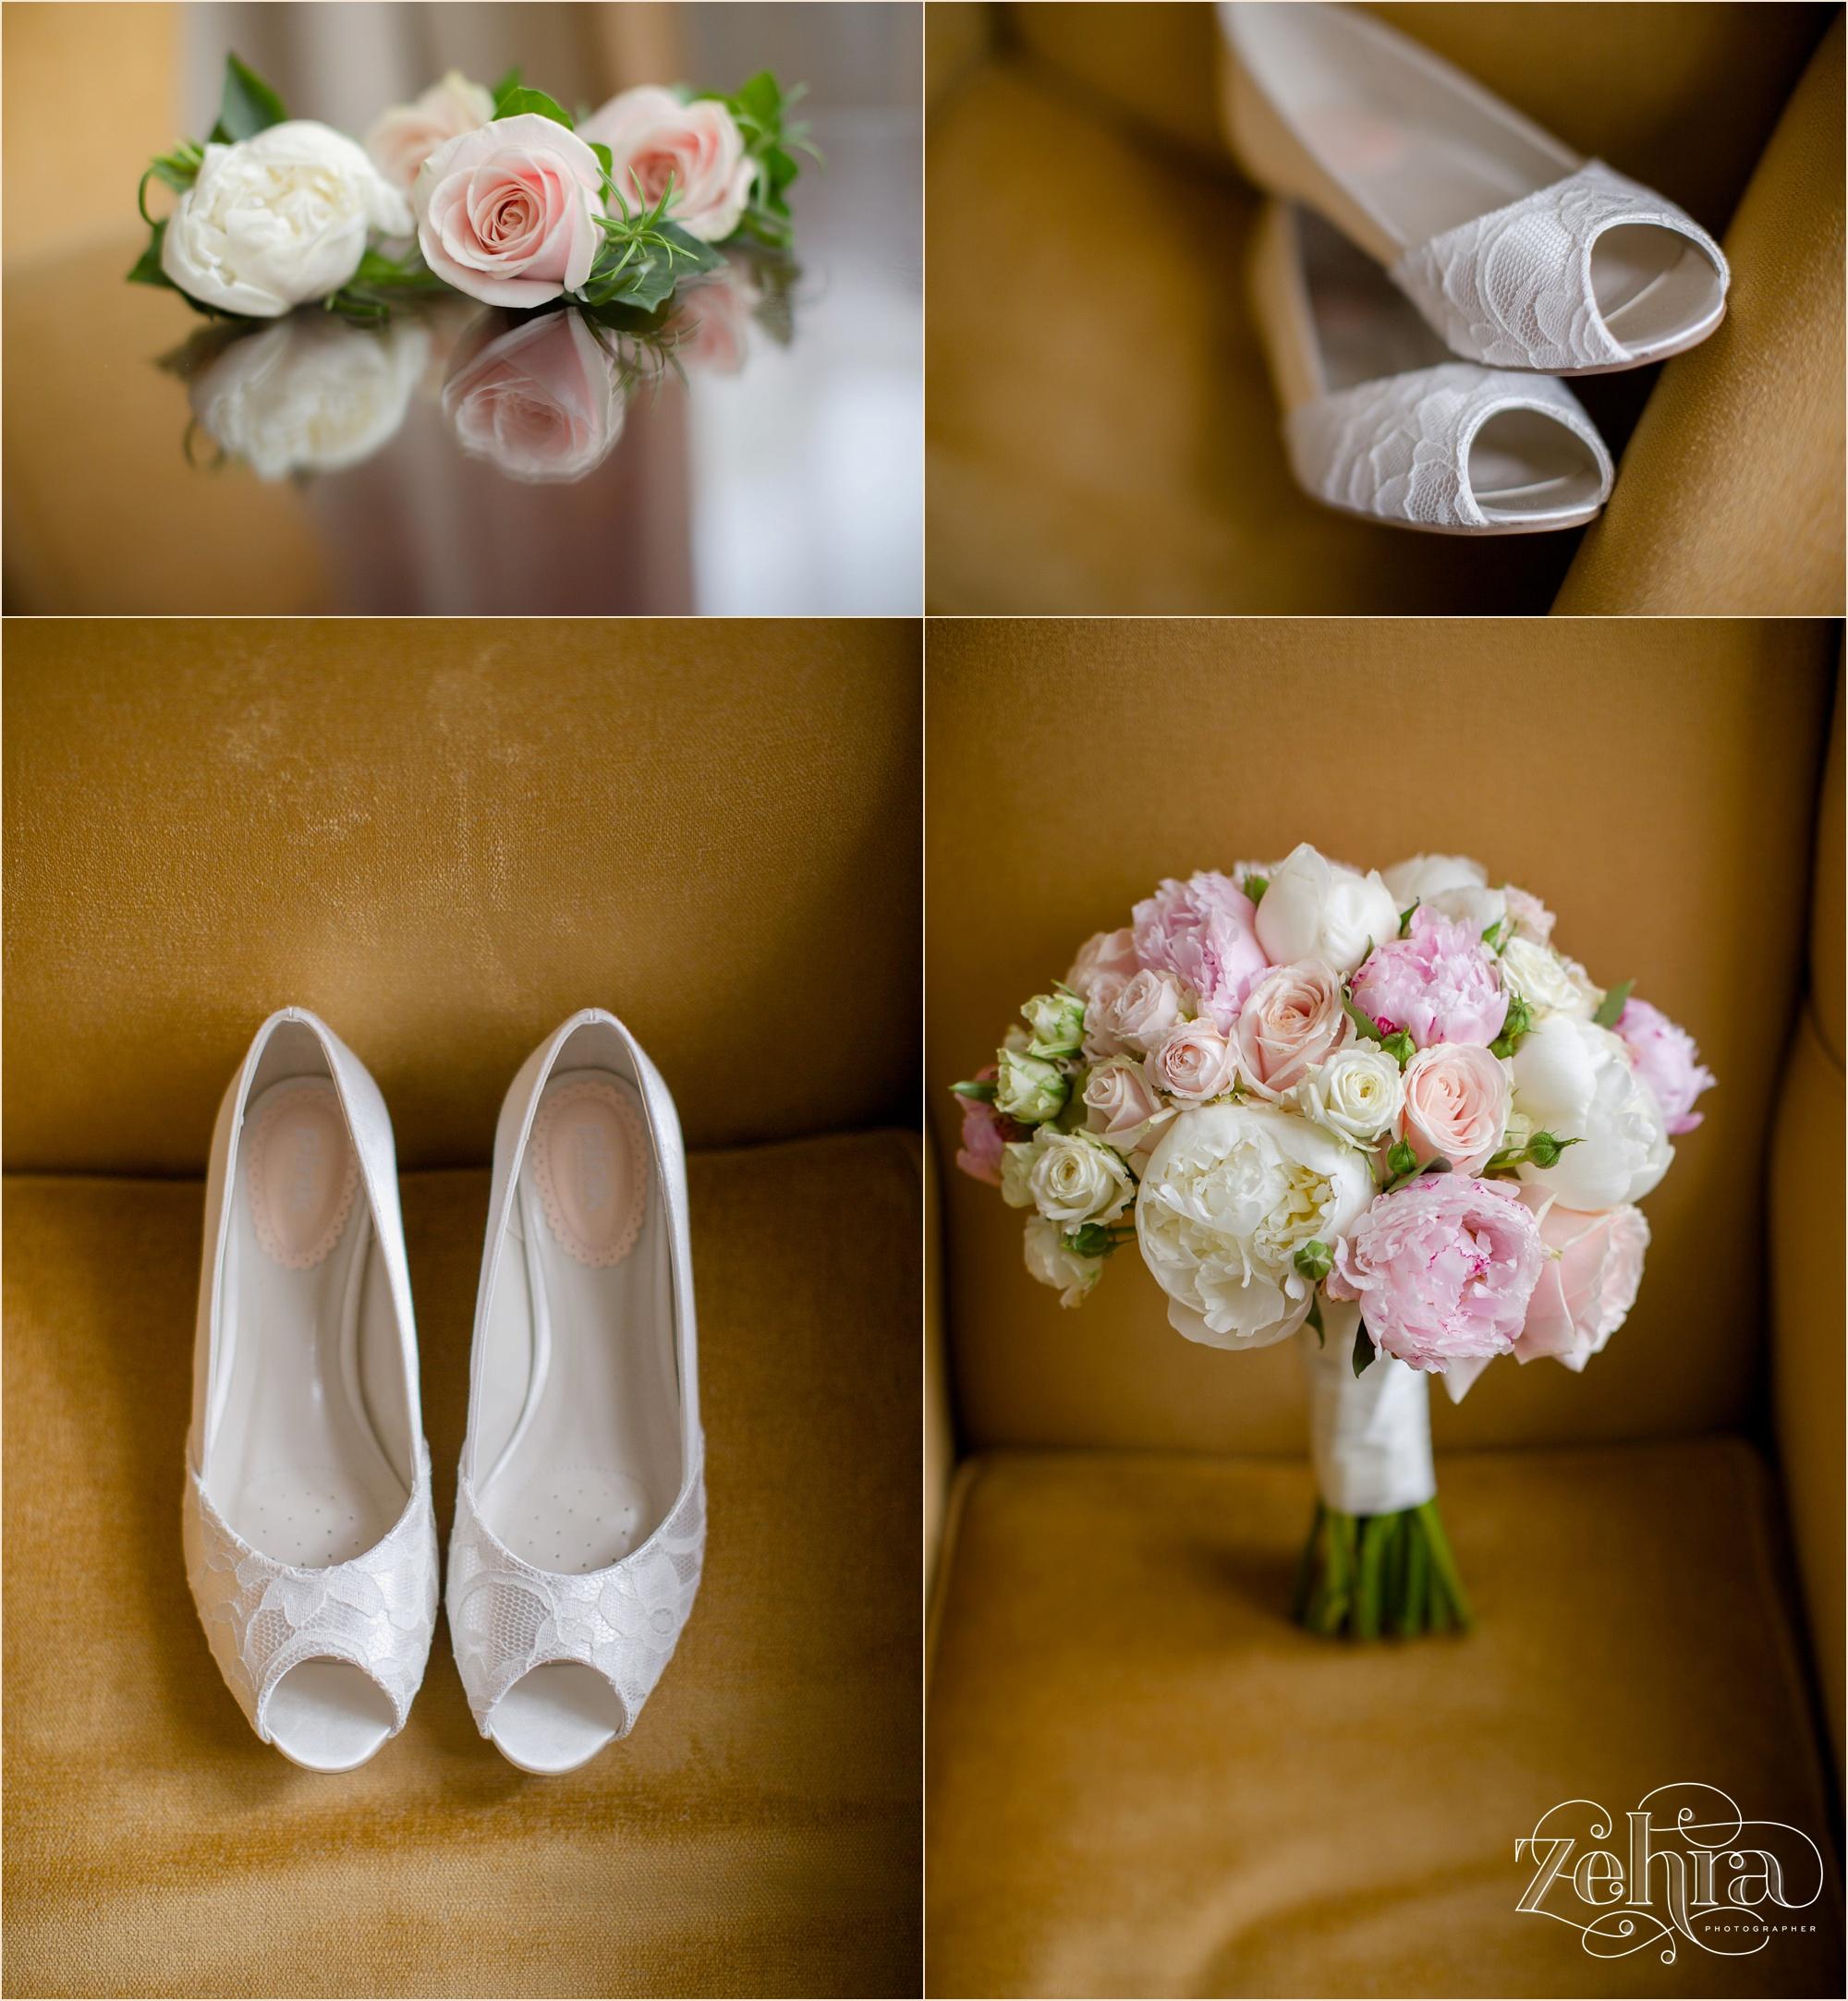 jasira manchester wedding photographer_0005.jpg